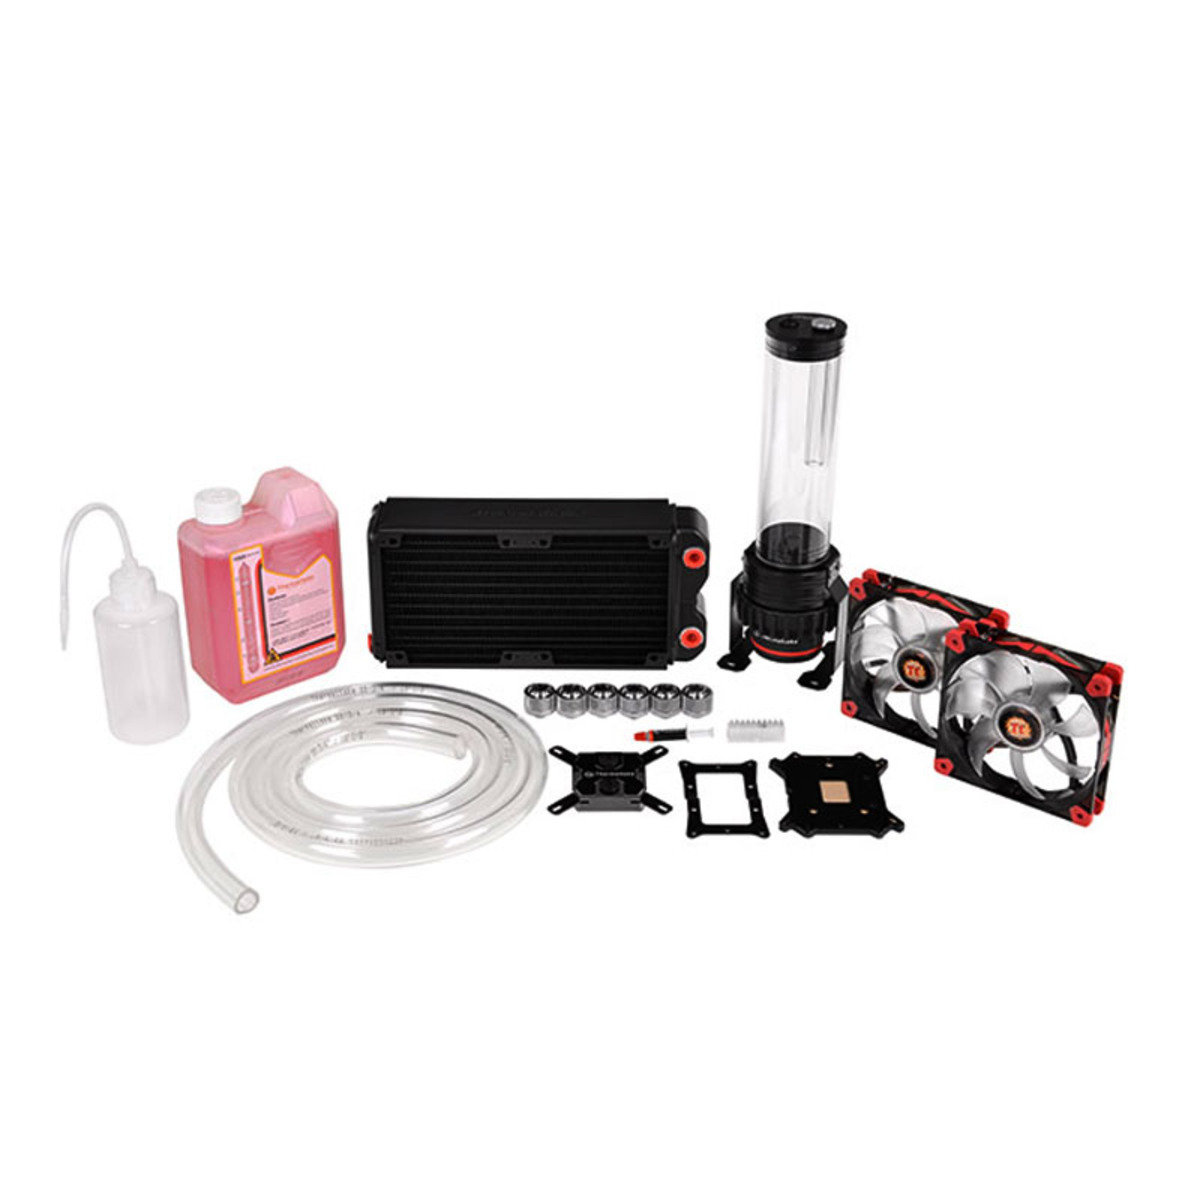 DIY玩家級 中央處理器 240mm液冷散熱器 Pacific RL240 Water Cooling Kit